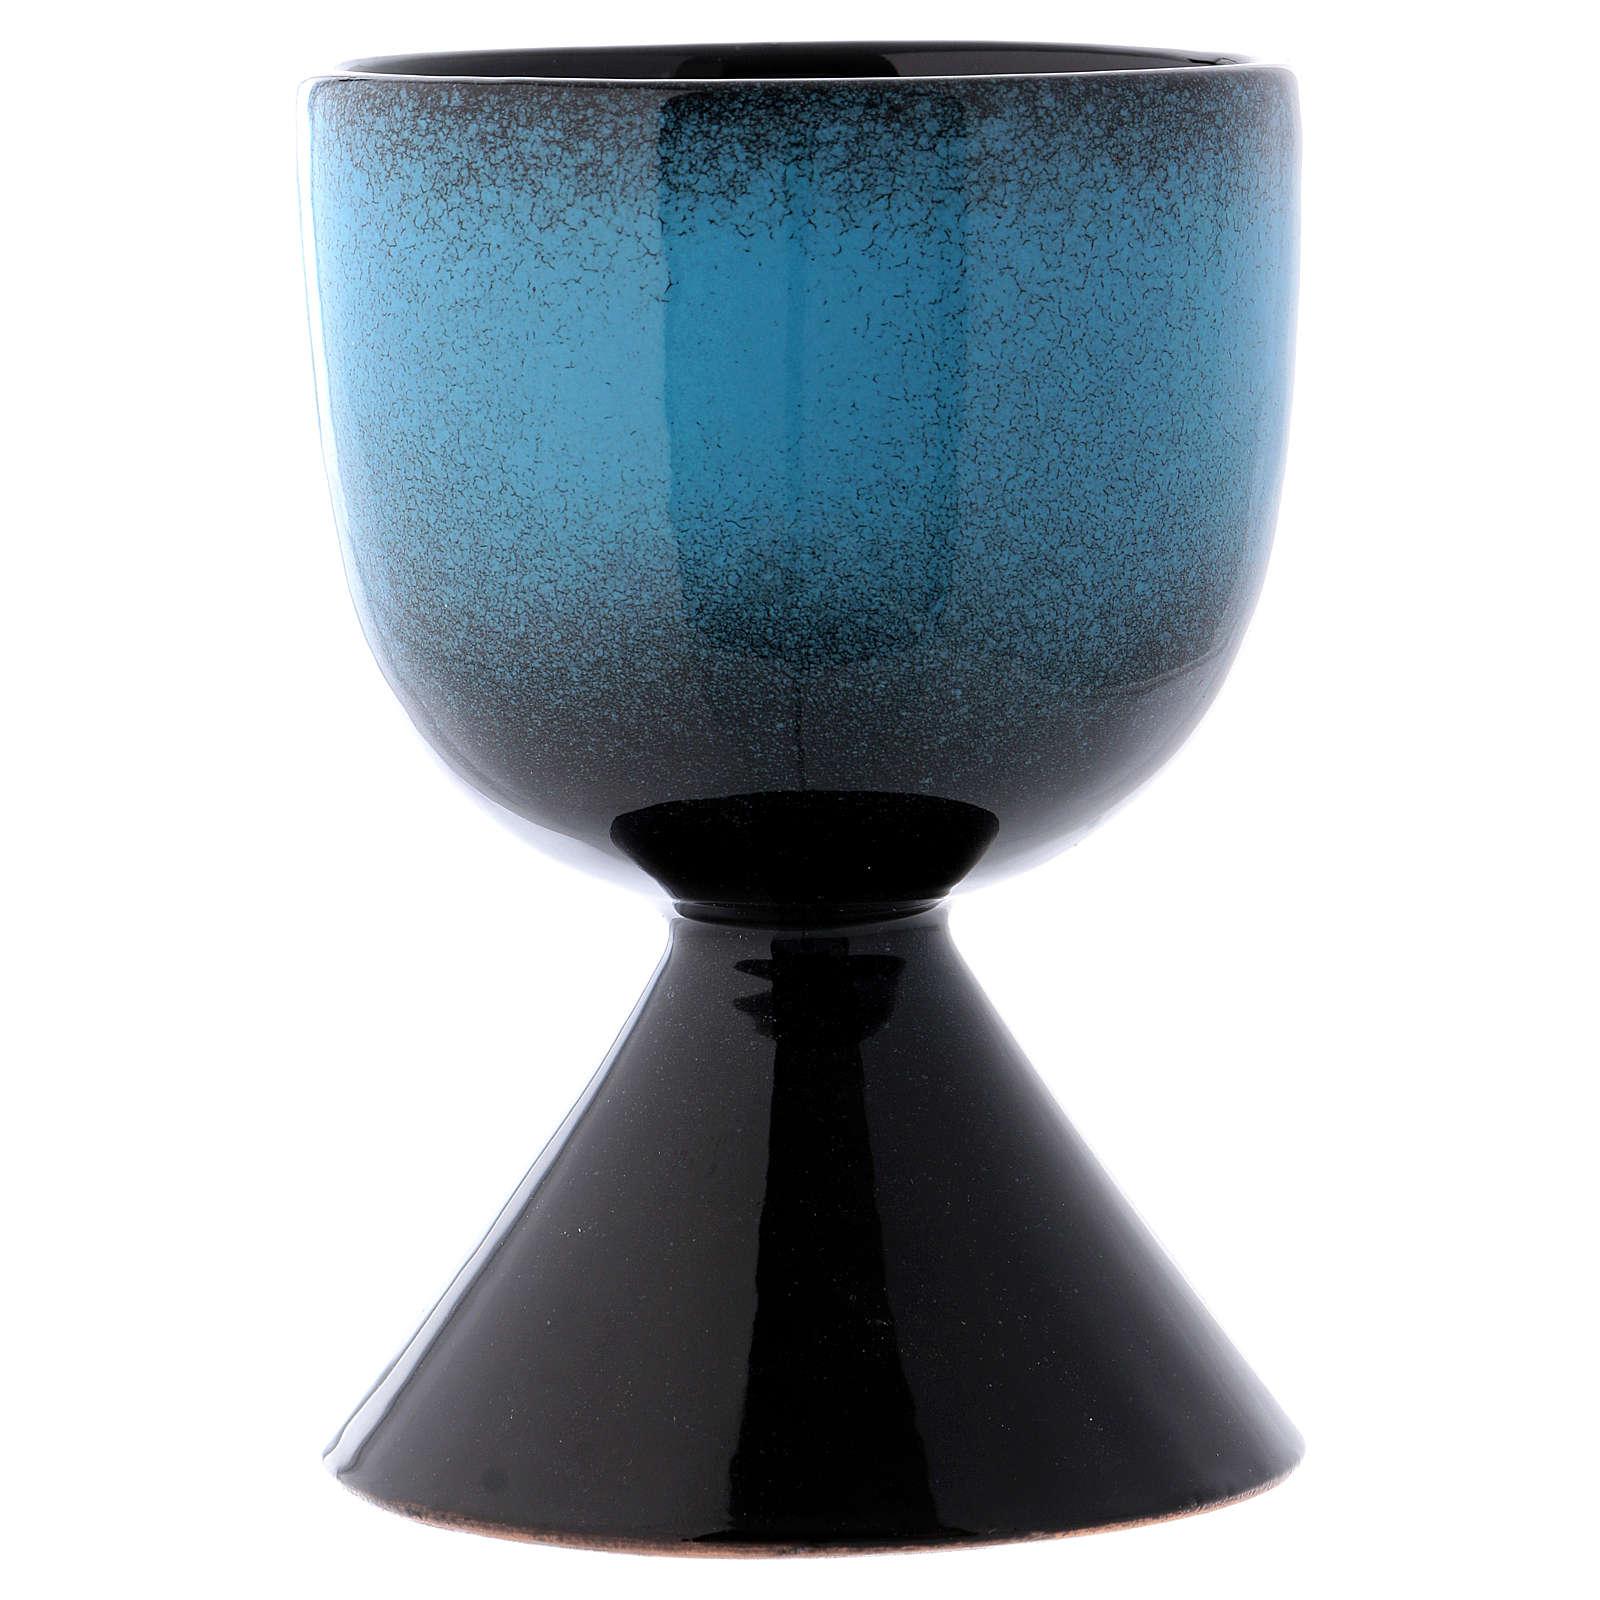 Calice céramique turquoise symbole Marial 4